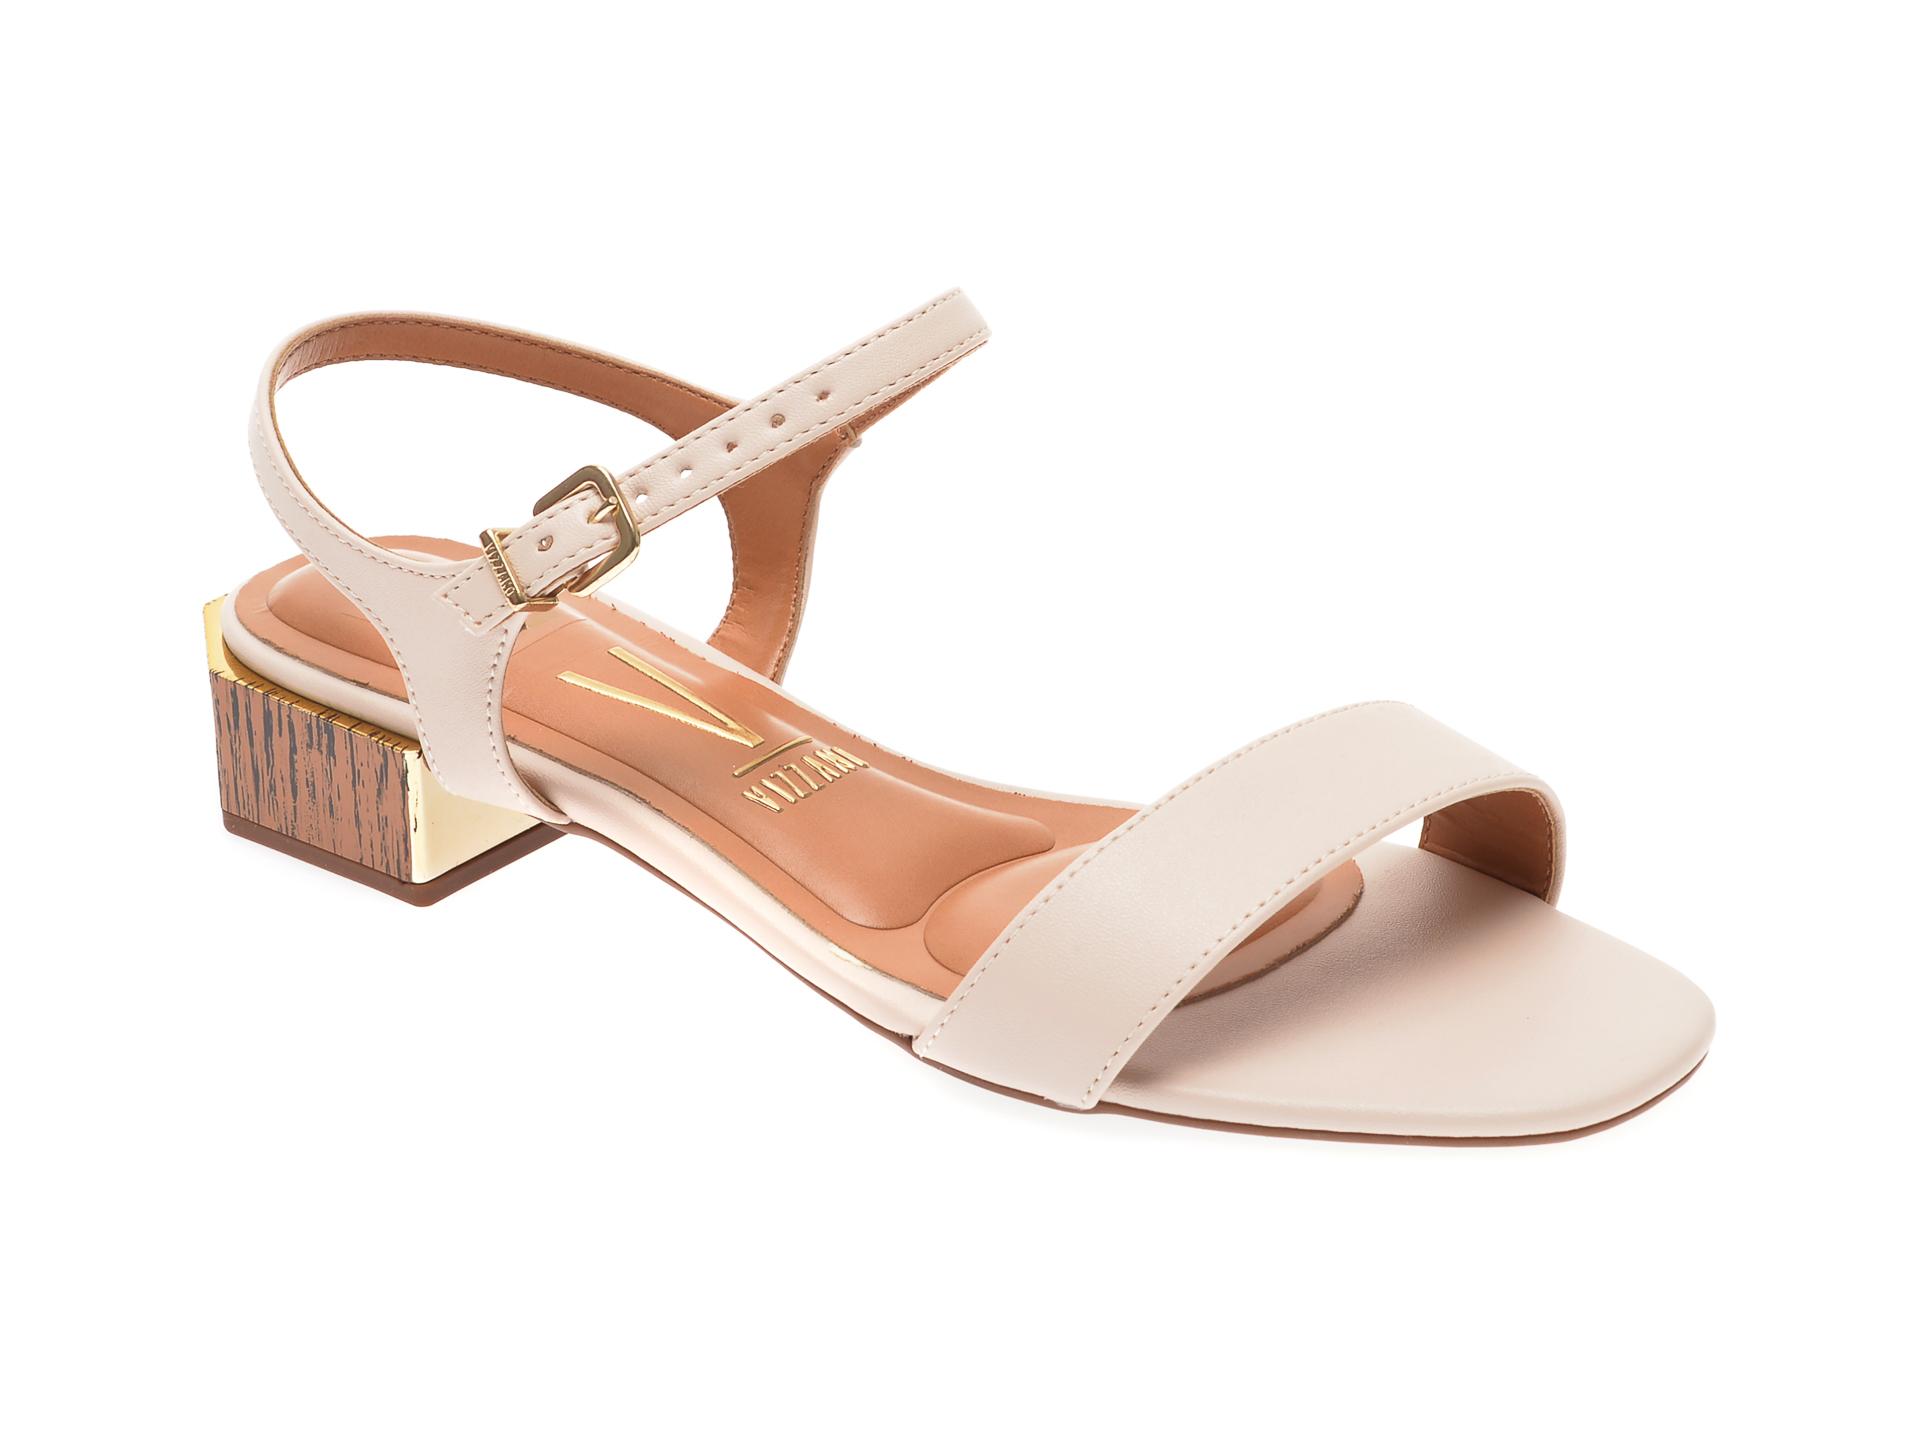 Sandale VIZZANO bej, 6423201, din piele ecologica